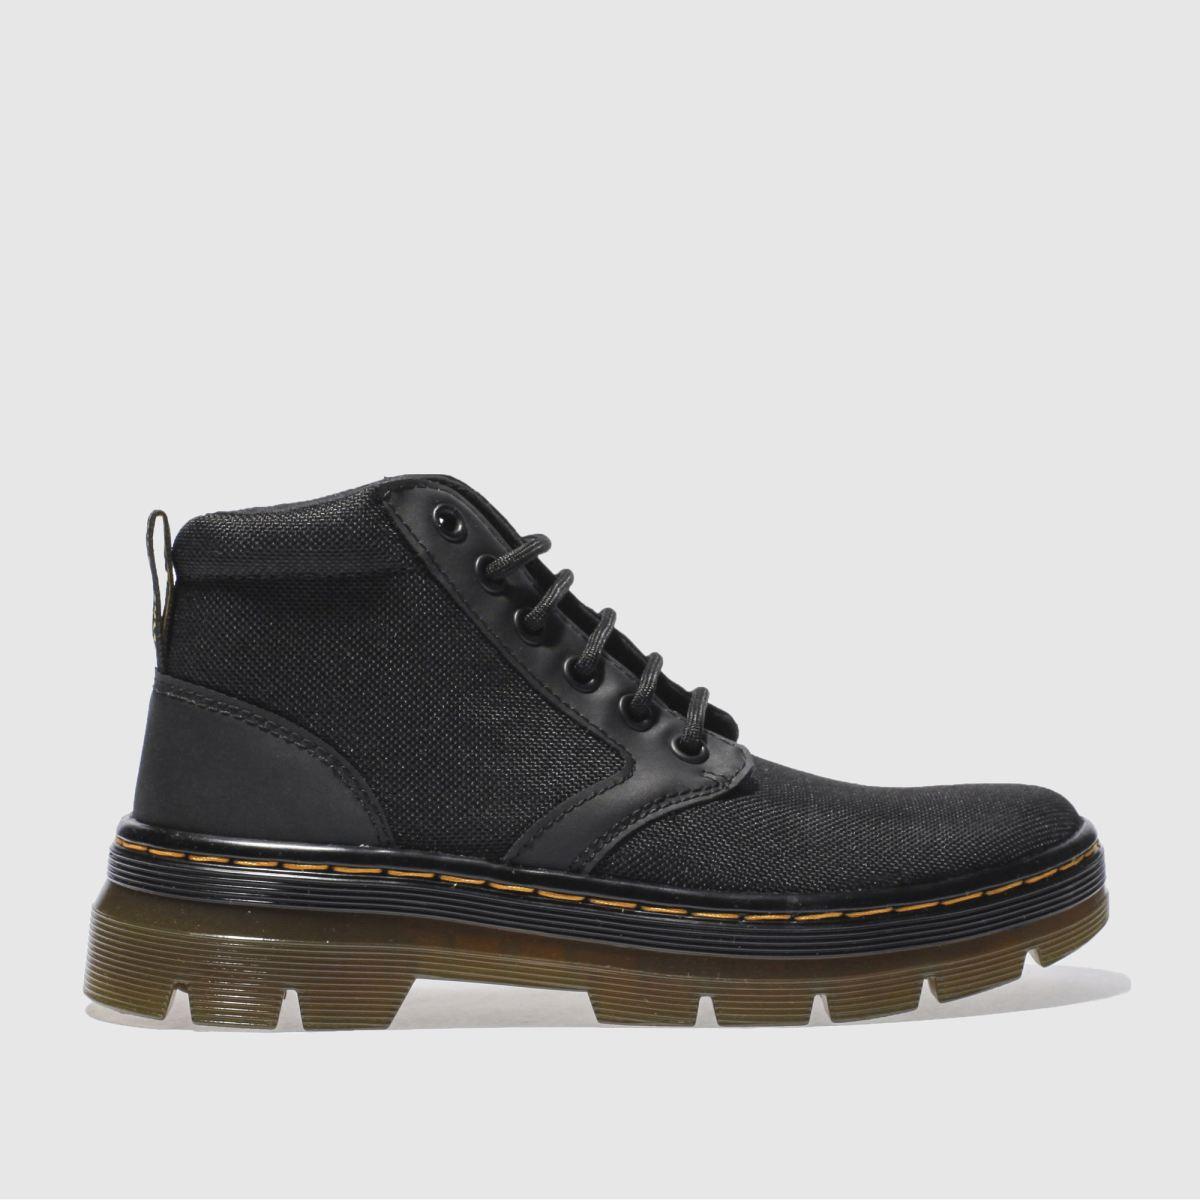 Dr Martens Black Tract Bonny New Chukka Boots